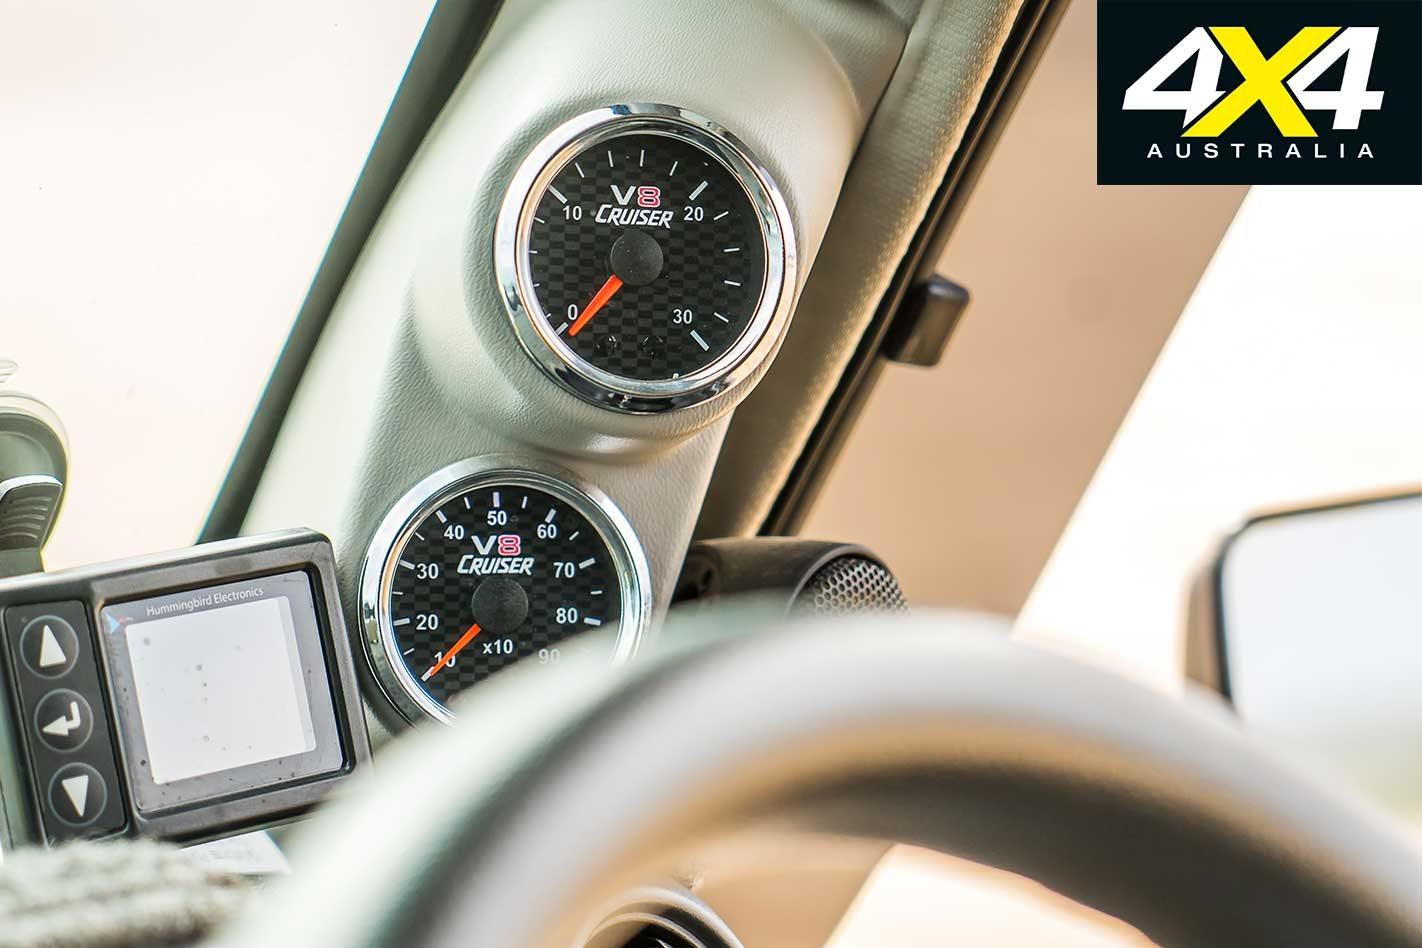 GALLERY: Toyota Land Cruiser 79 Series